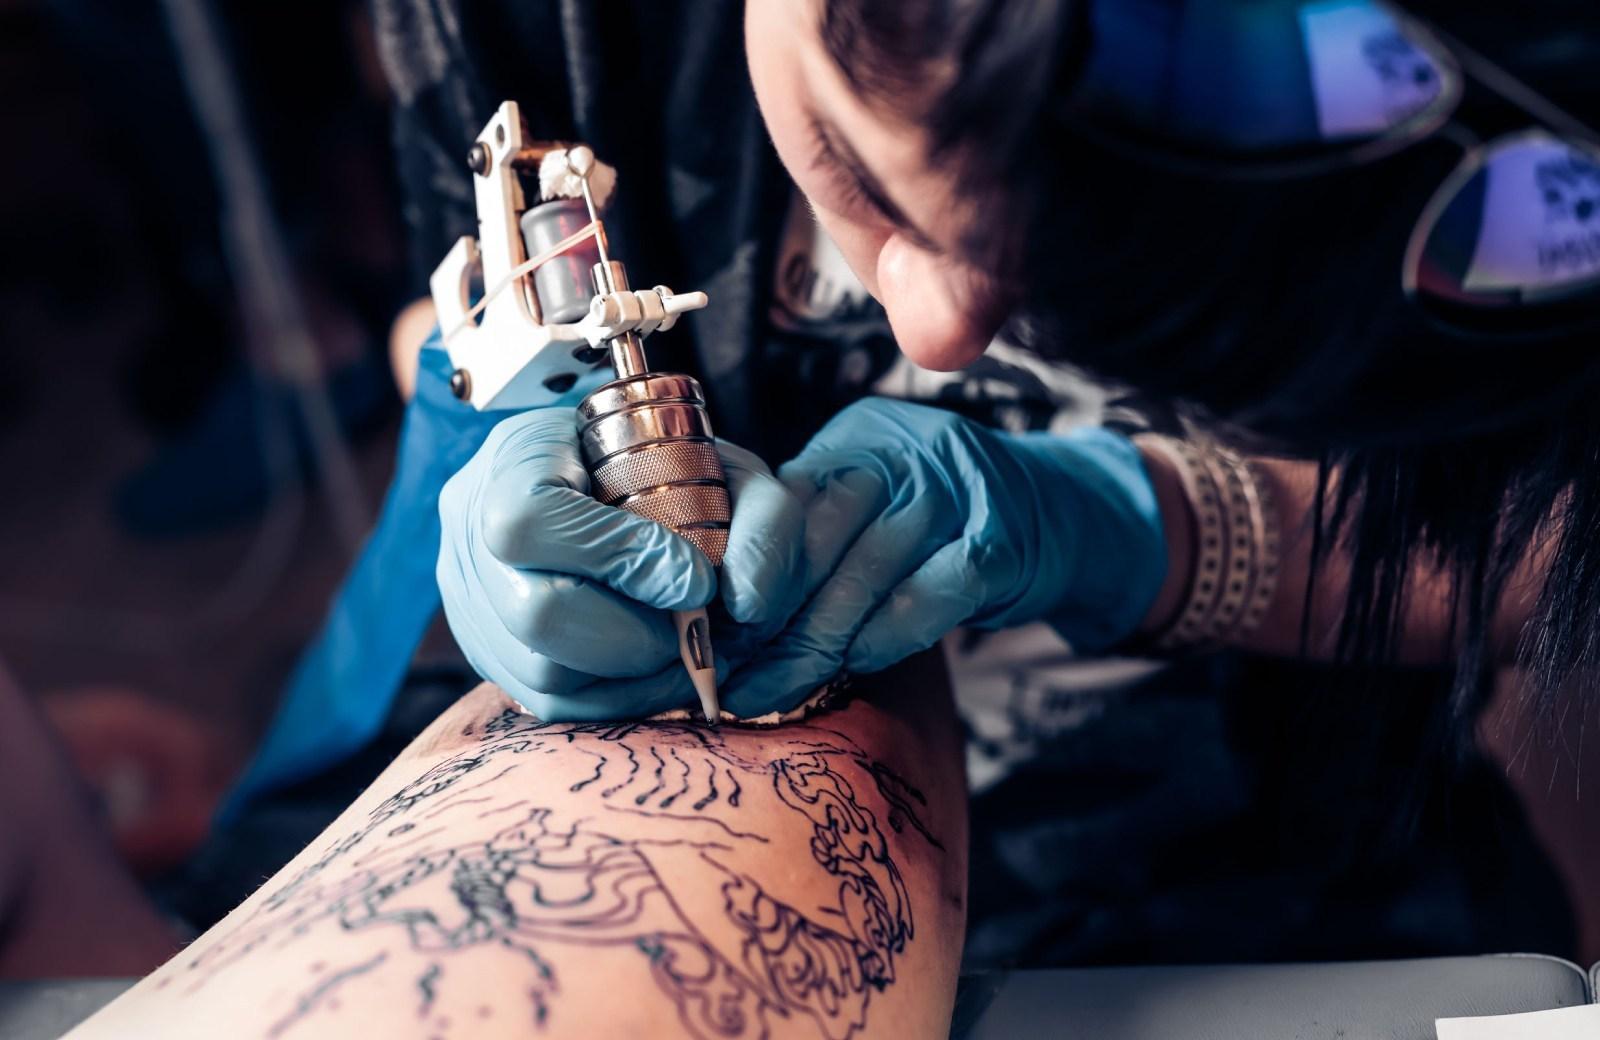 tattoo artist at work